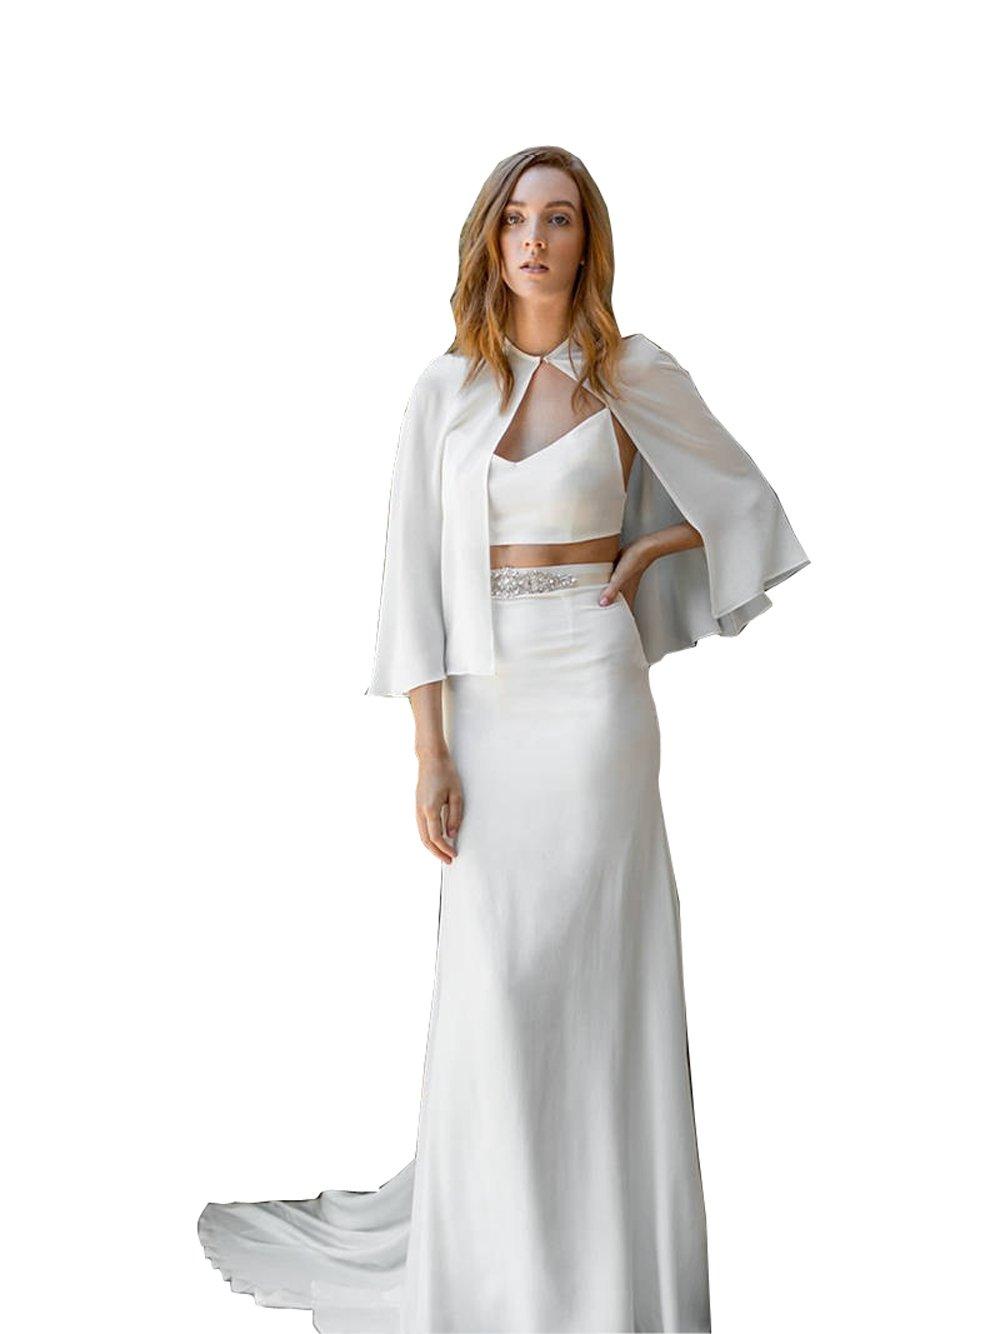 kelaixiang Wedding Cloak Bridal Cape Short Jacket for Bride Wedding (Lvory, 50cm)